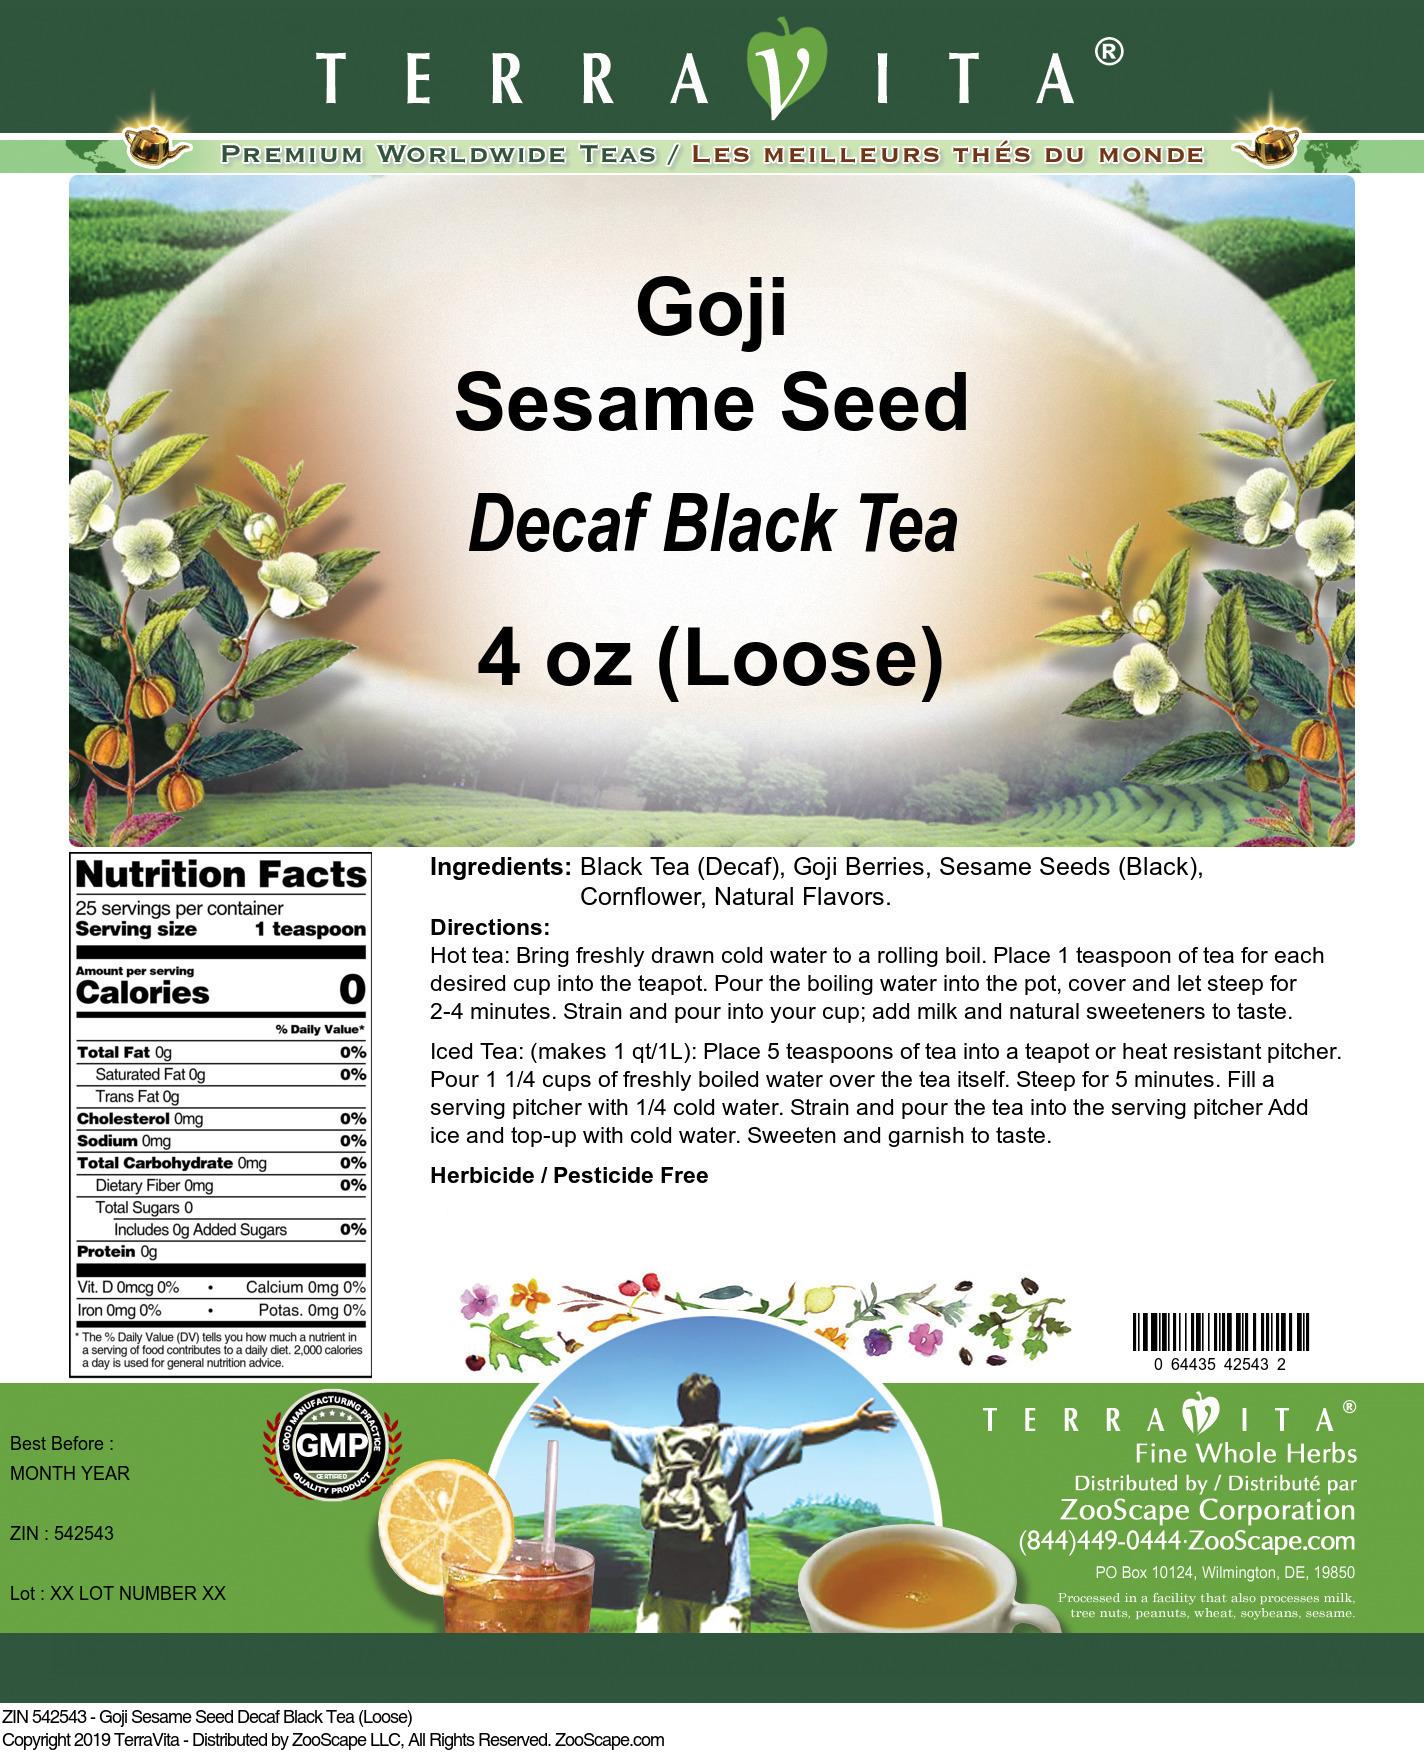 Goji Sesame Seed Decaf Black Tea (Loose)